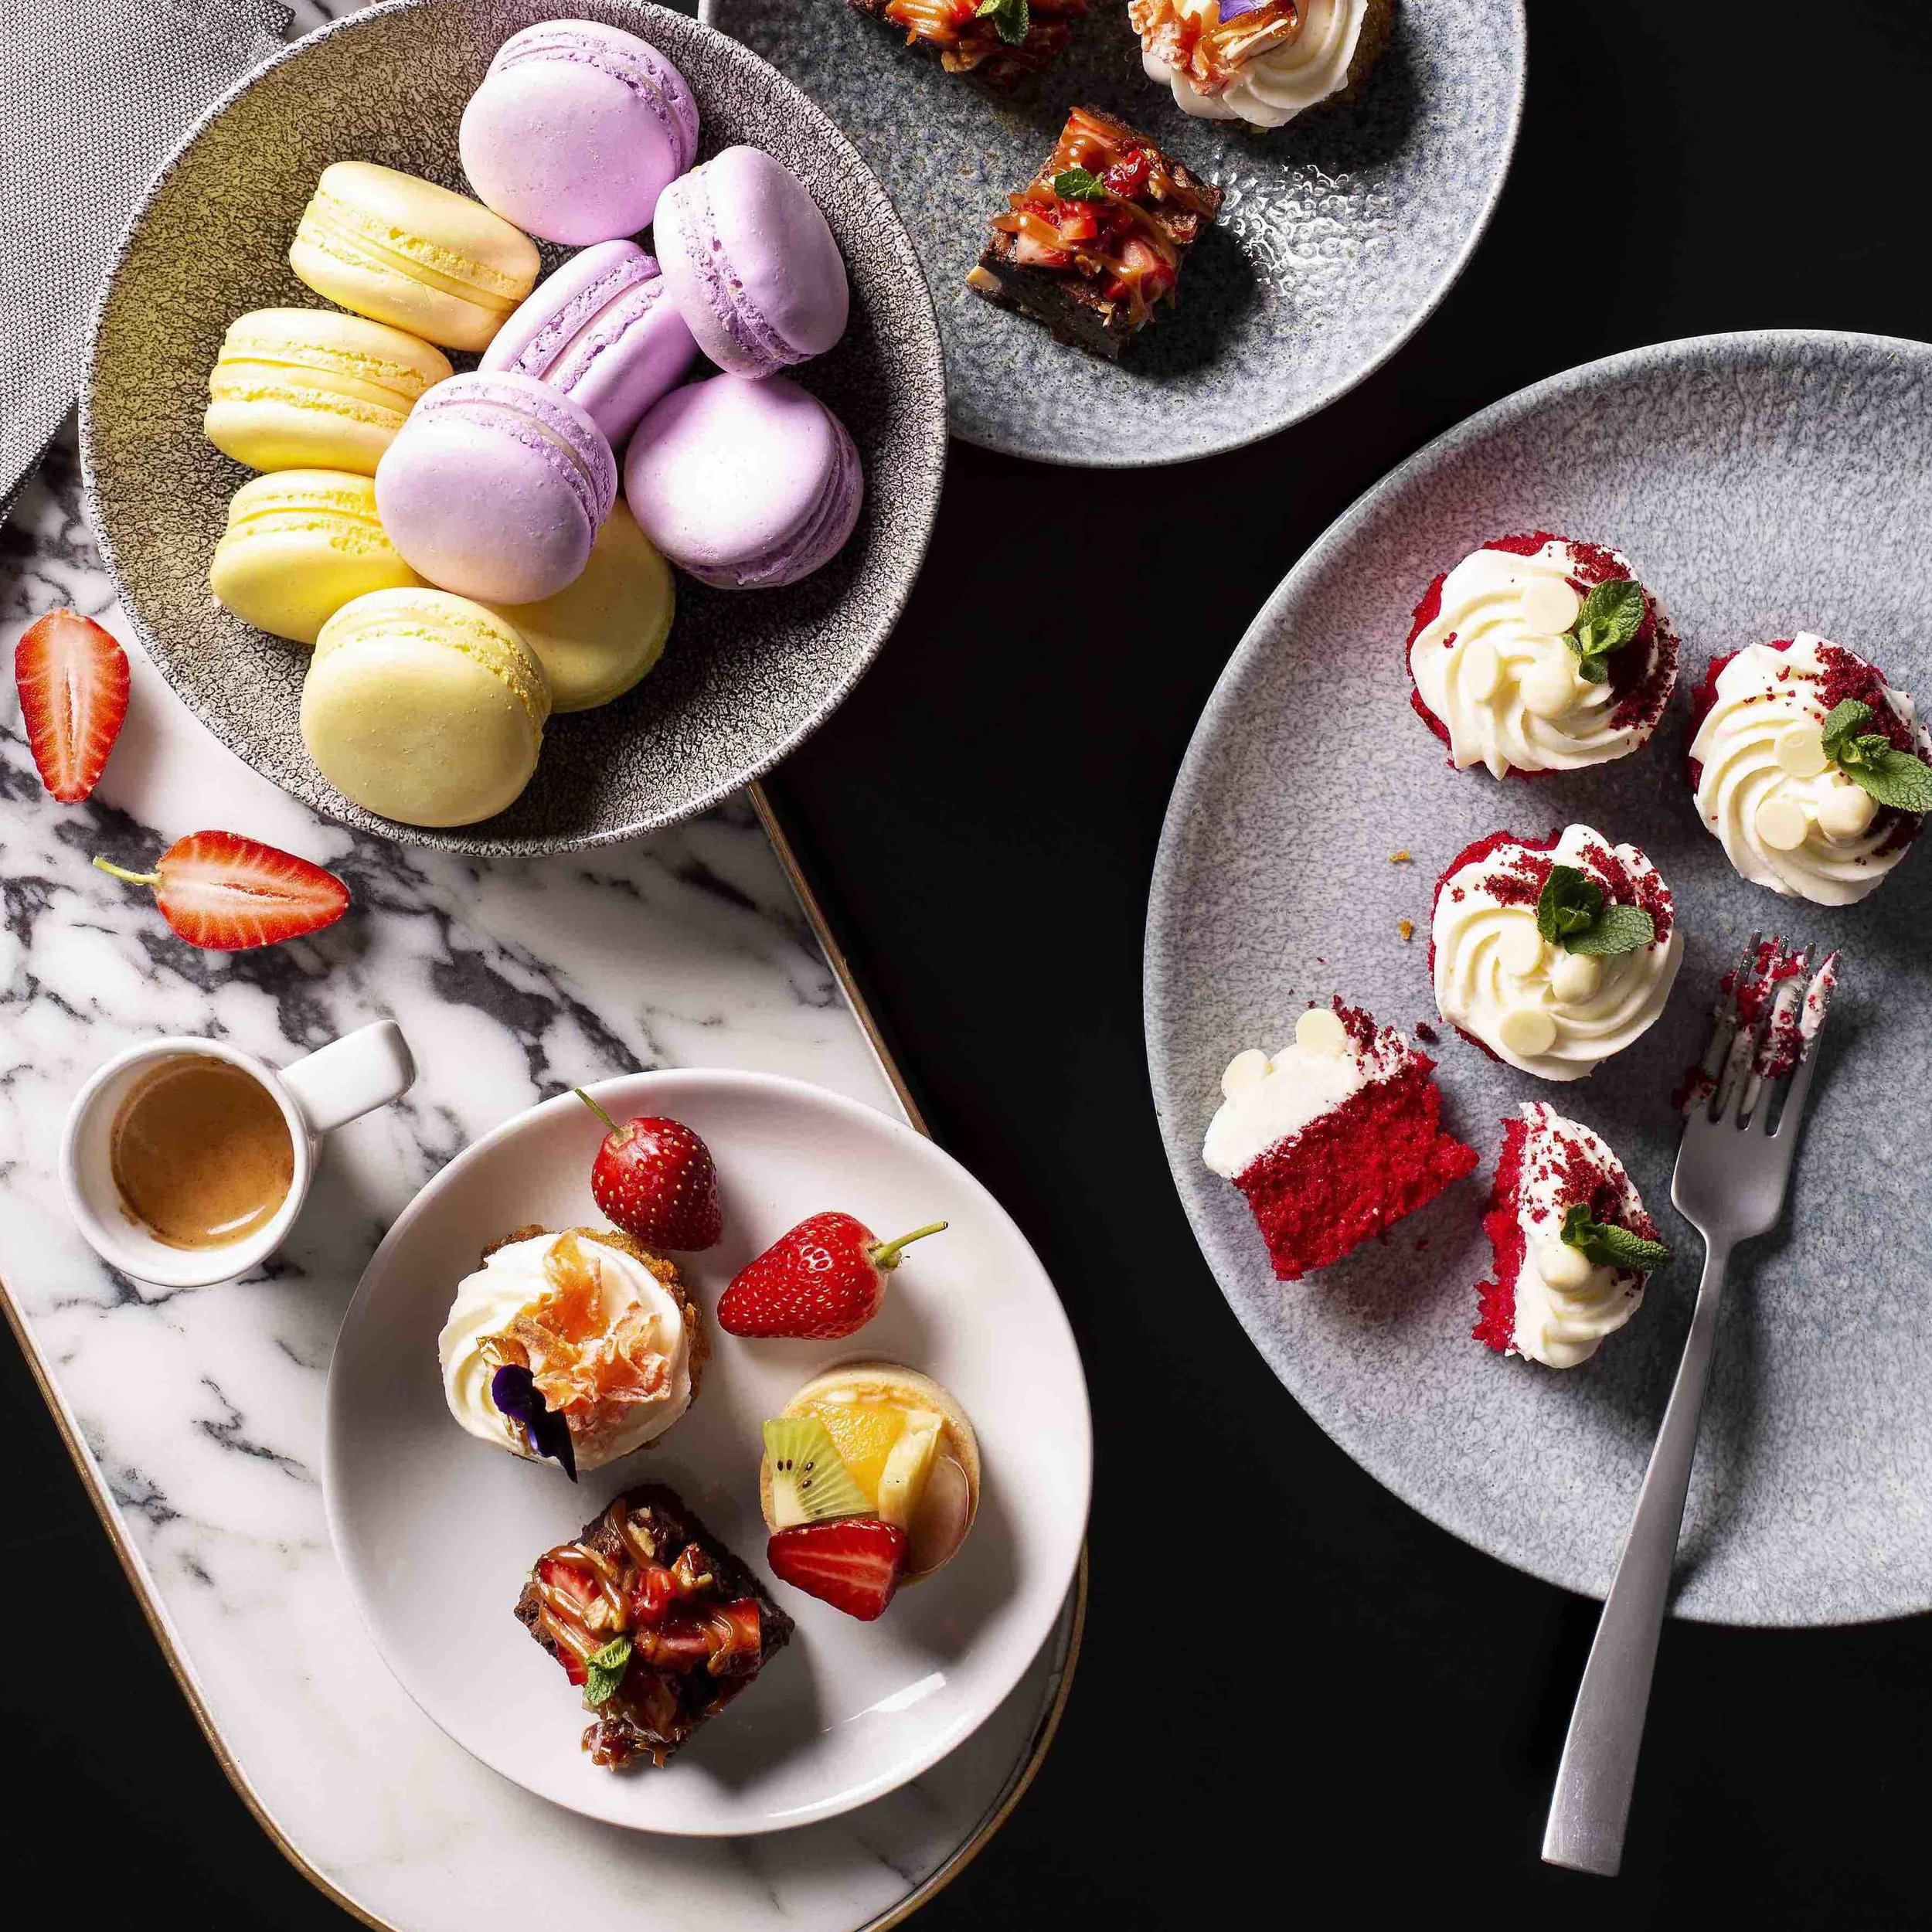 Dessert PlatterR 610 – - Decadent dark Chocolate brownies, fruit and custard tartelettes, red velvet cakes, assorted macaroons, carrot and apple cake.